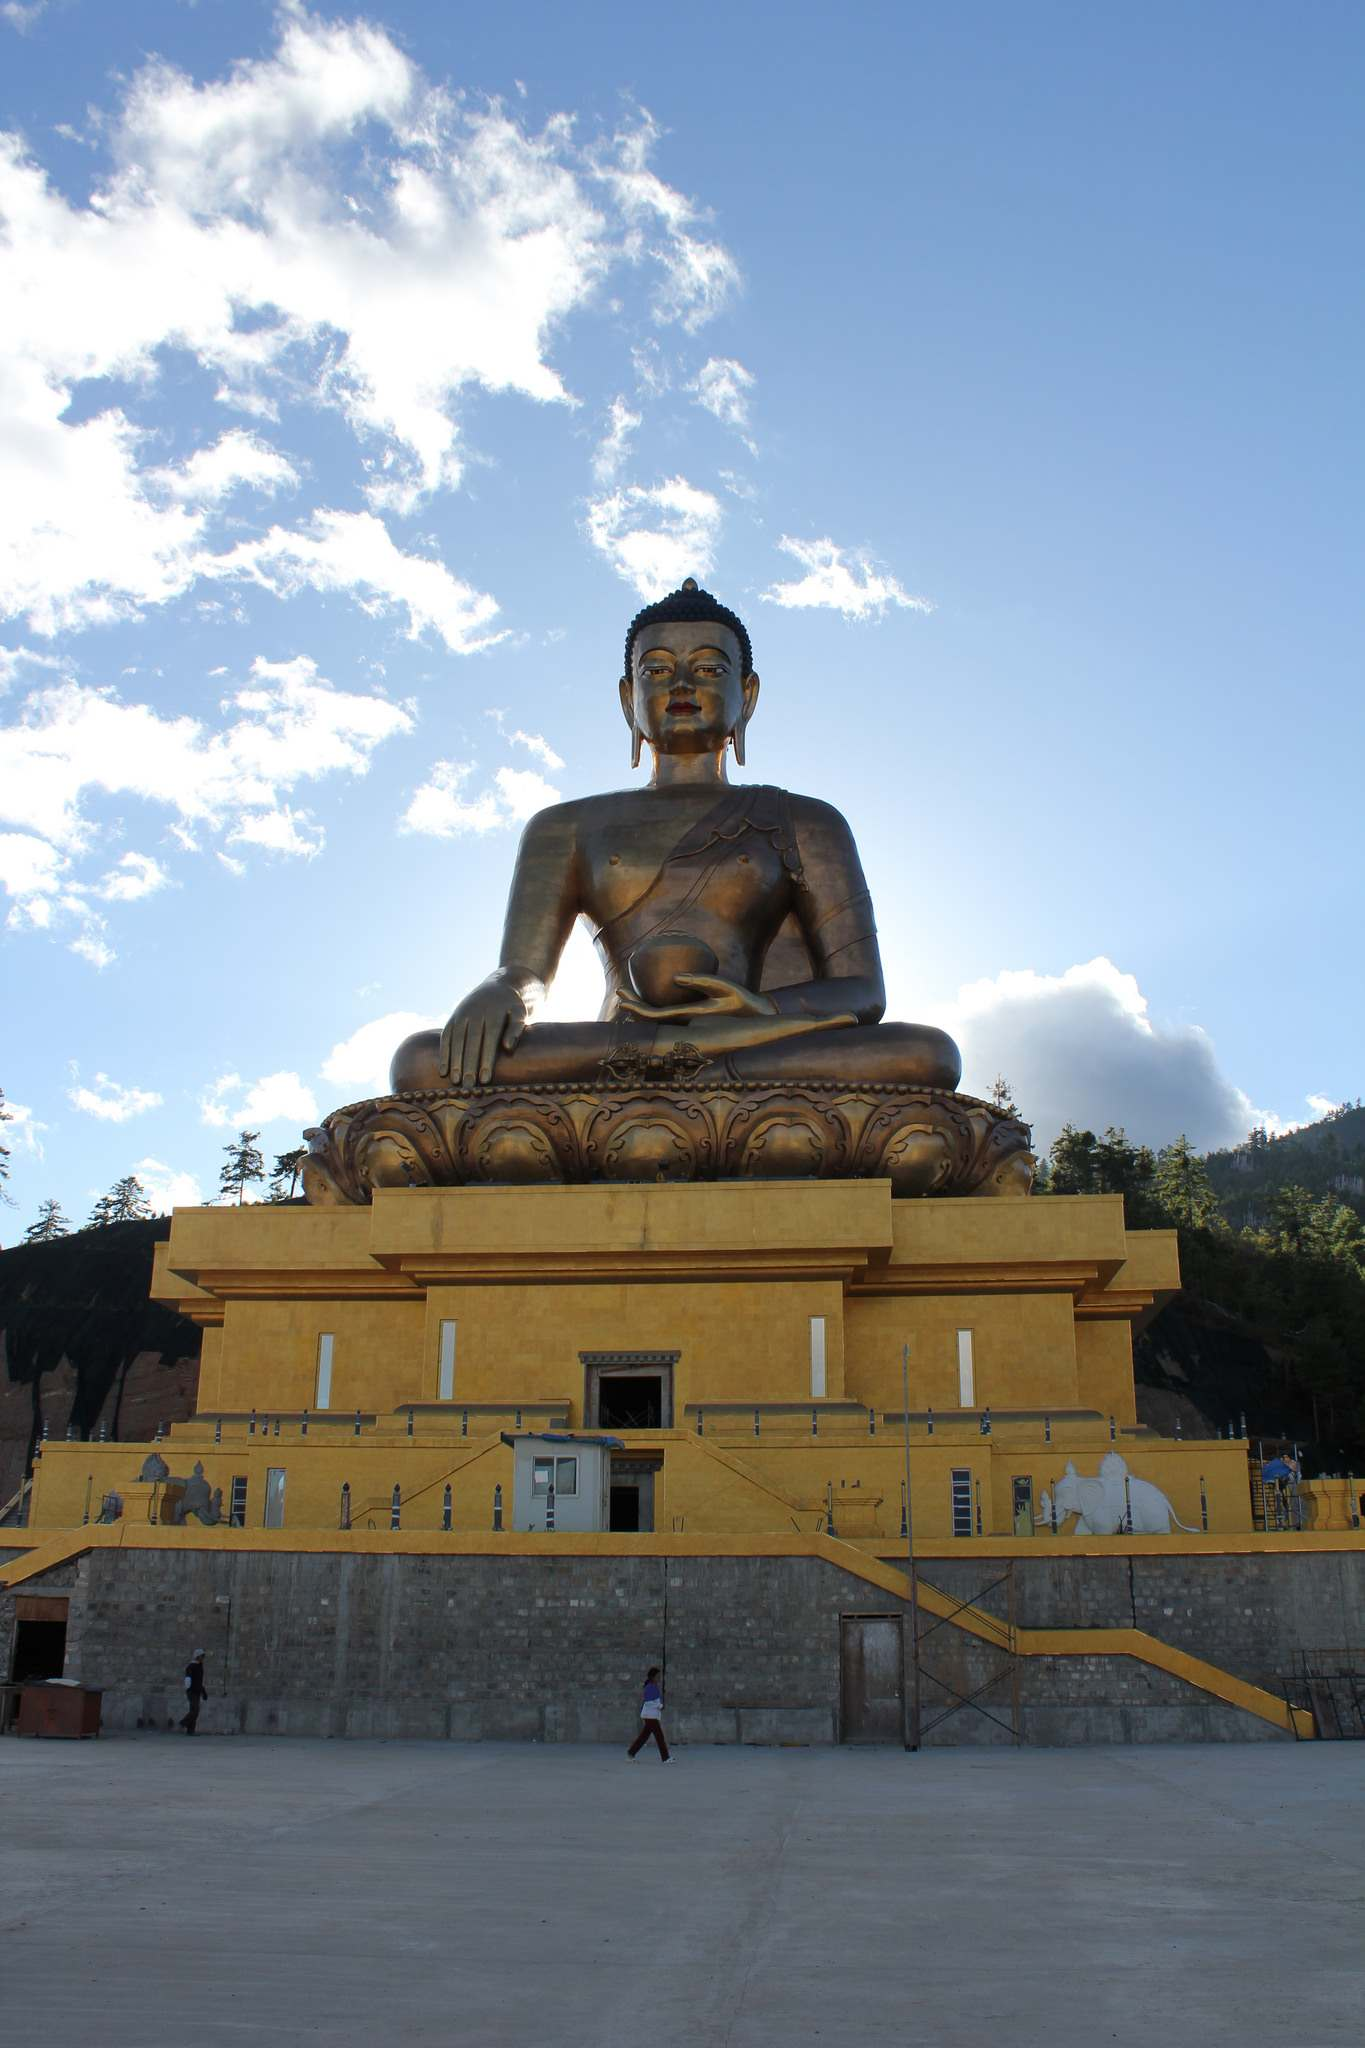 bhutan4 Bhutan   The Land of the Thunder Dragon